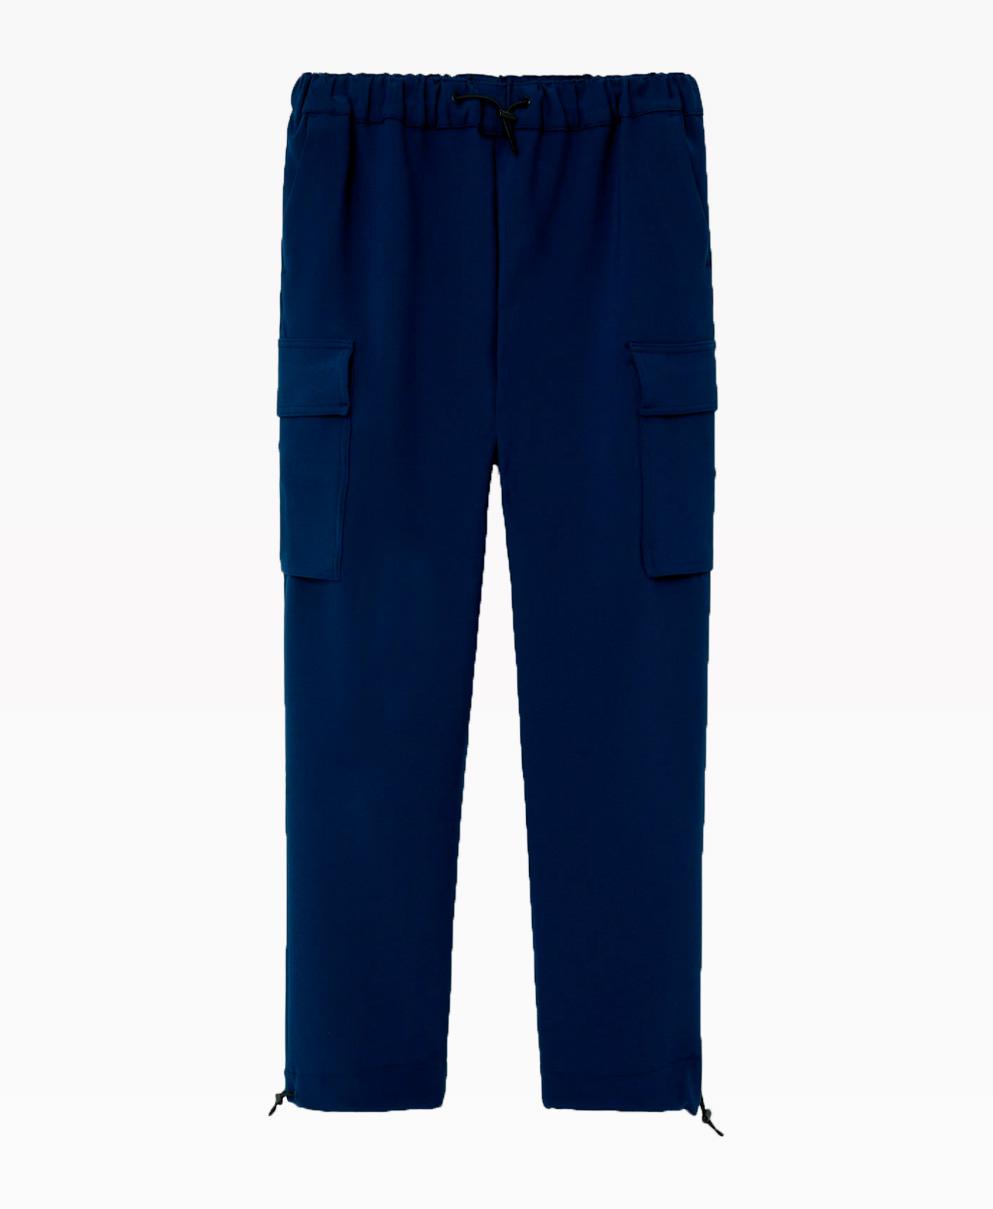 Loreak Mendian Mugi Pants Navy Blue Front